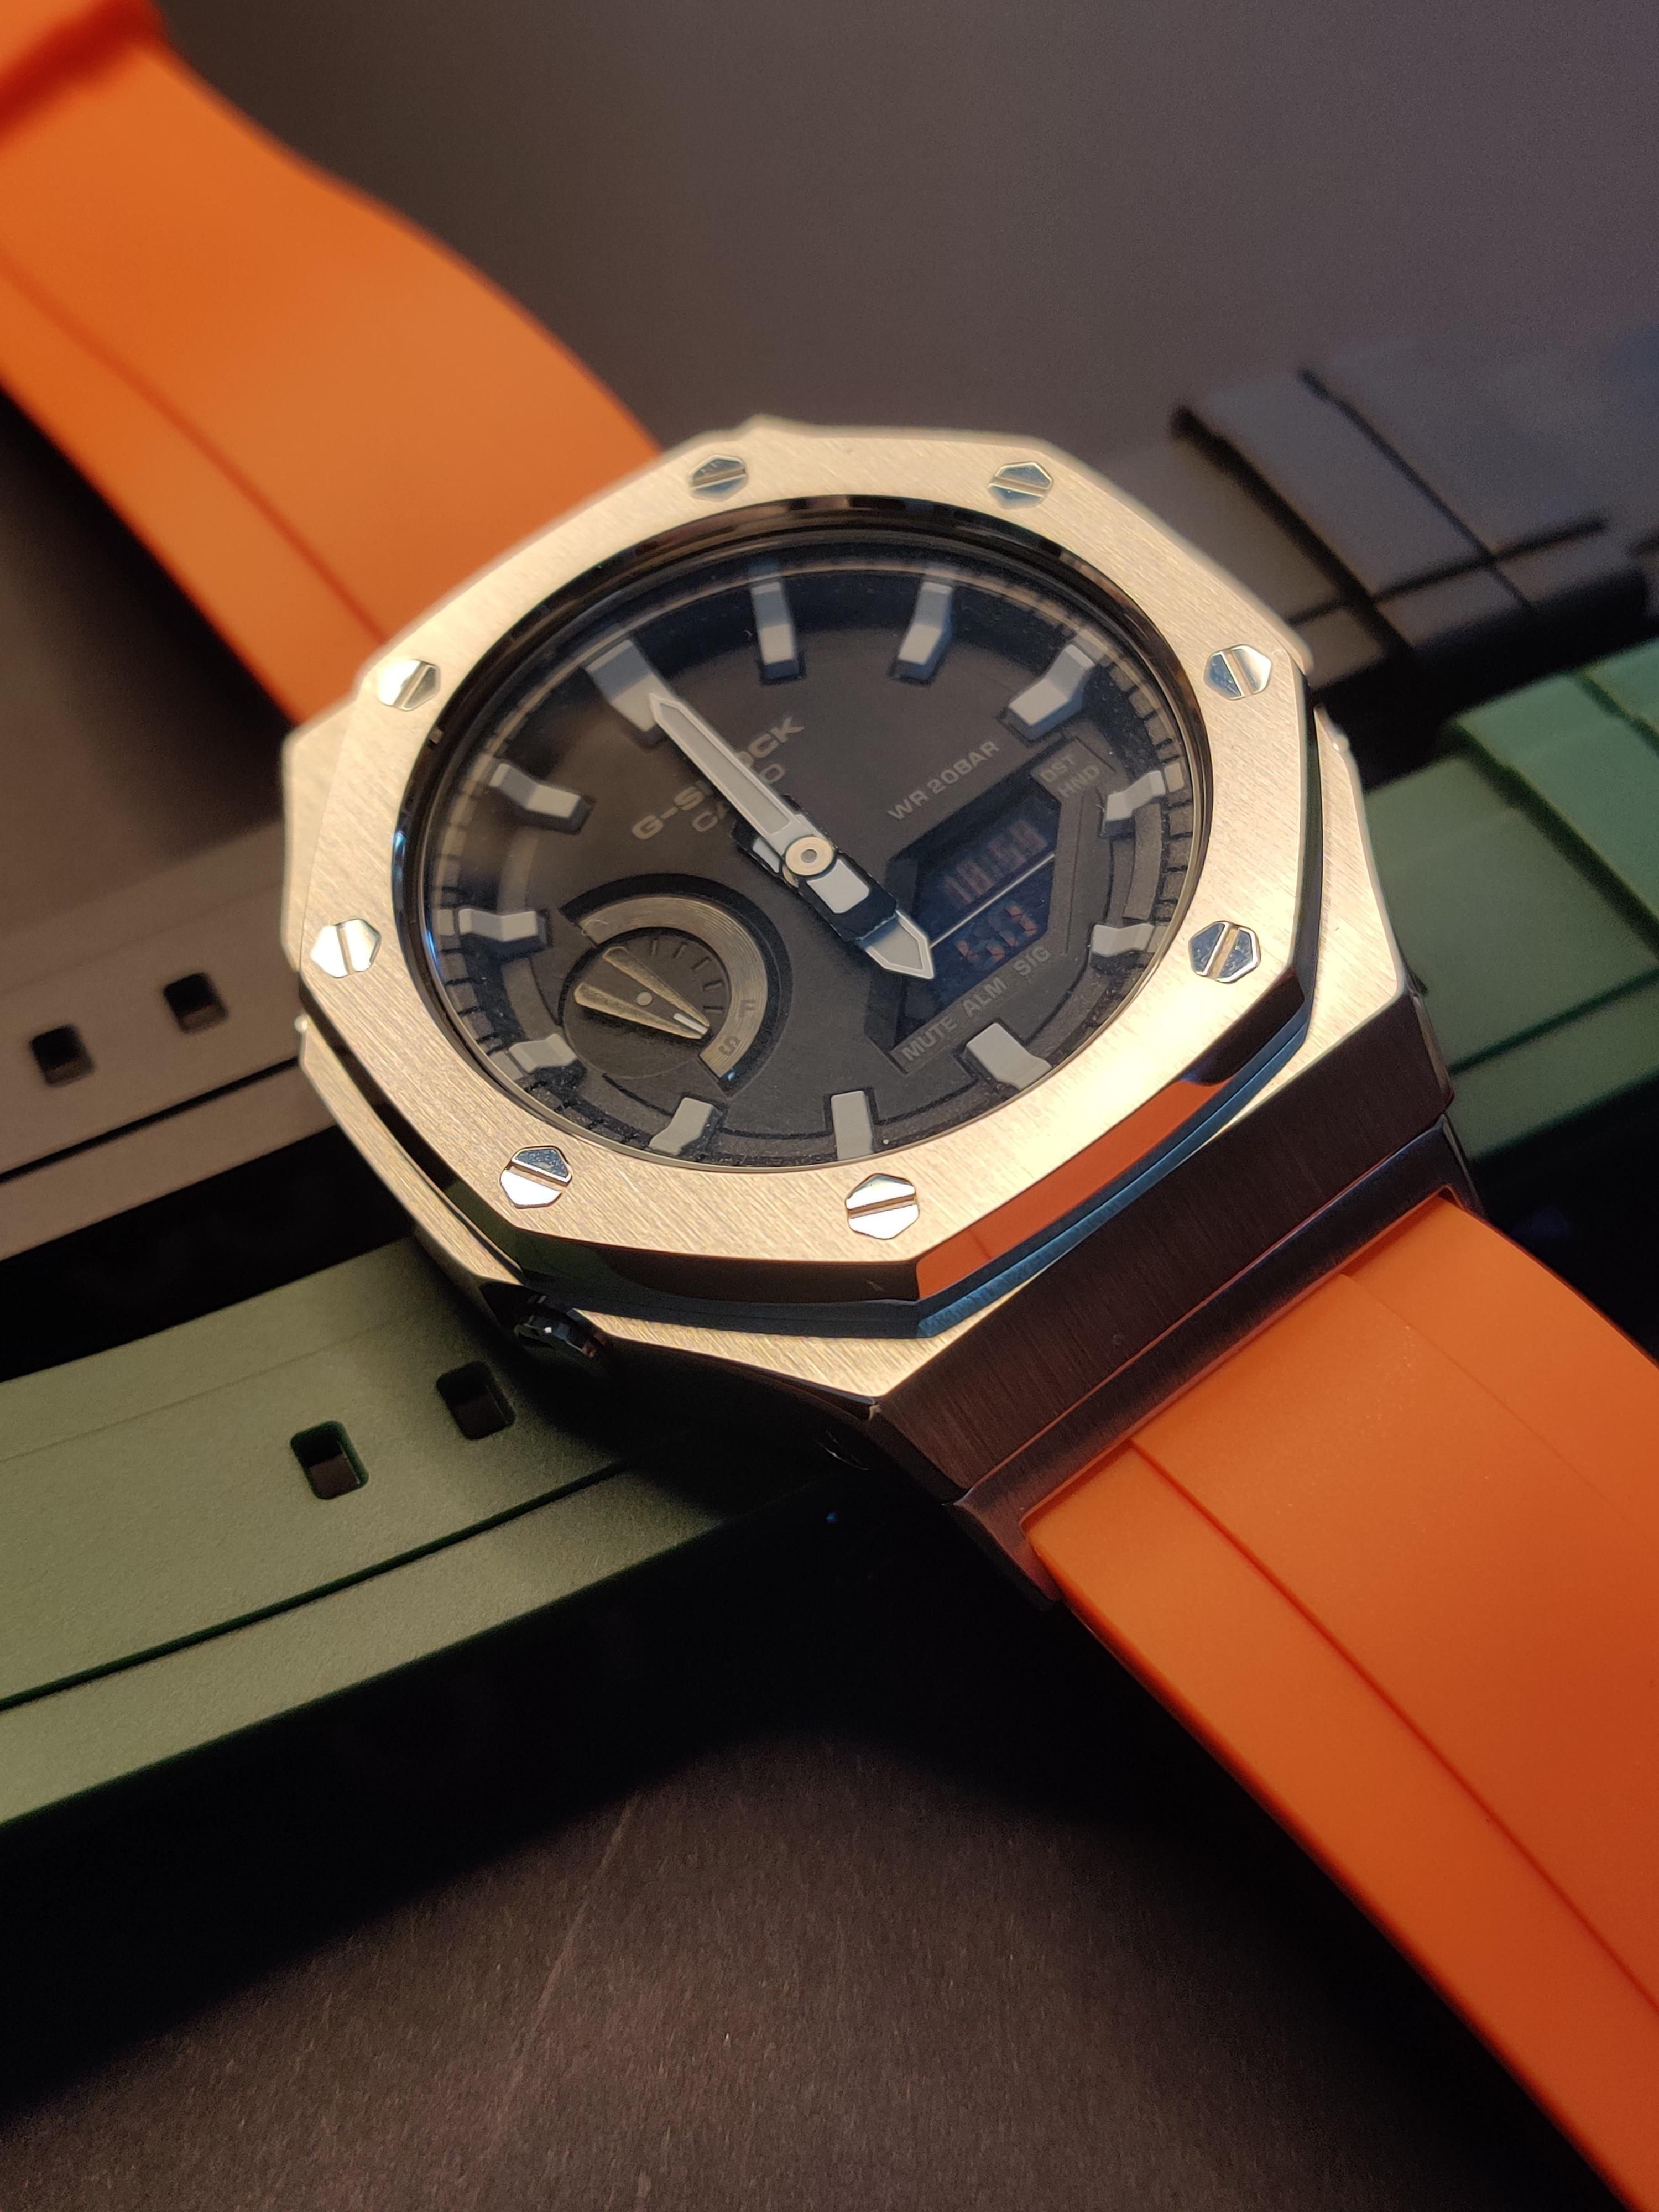 Hontao GA2100 2rd Generation Casioak Mod Metal Bezel GA2110 Watch Strap Adapter Fluorine Rubber Watch Band for GA-2100/2110 enlarge